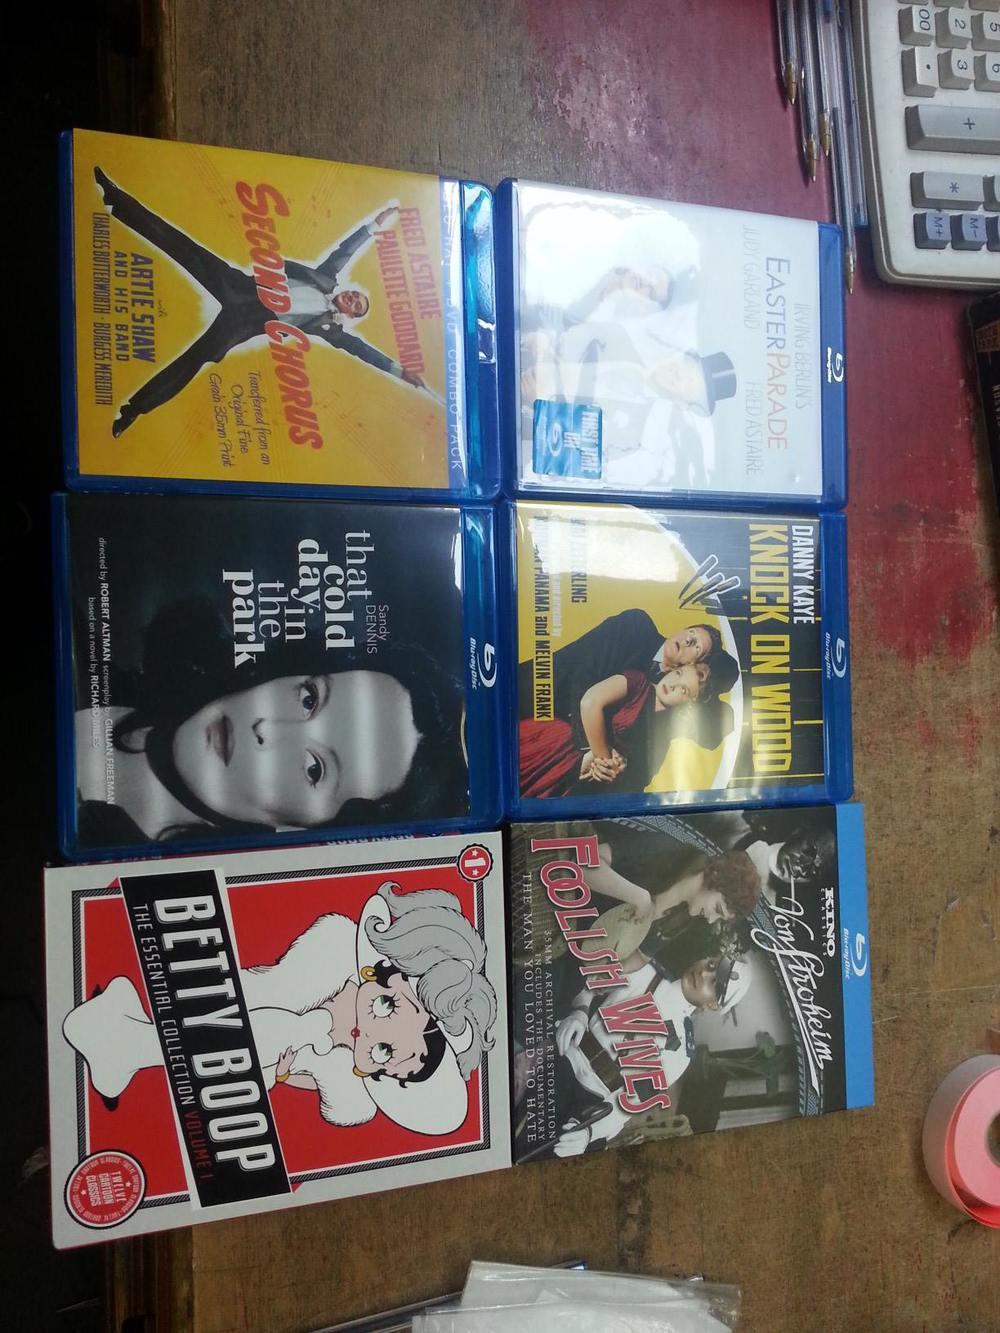 Some nice Blu-rays